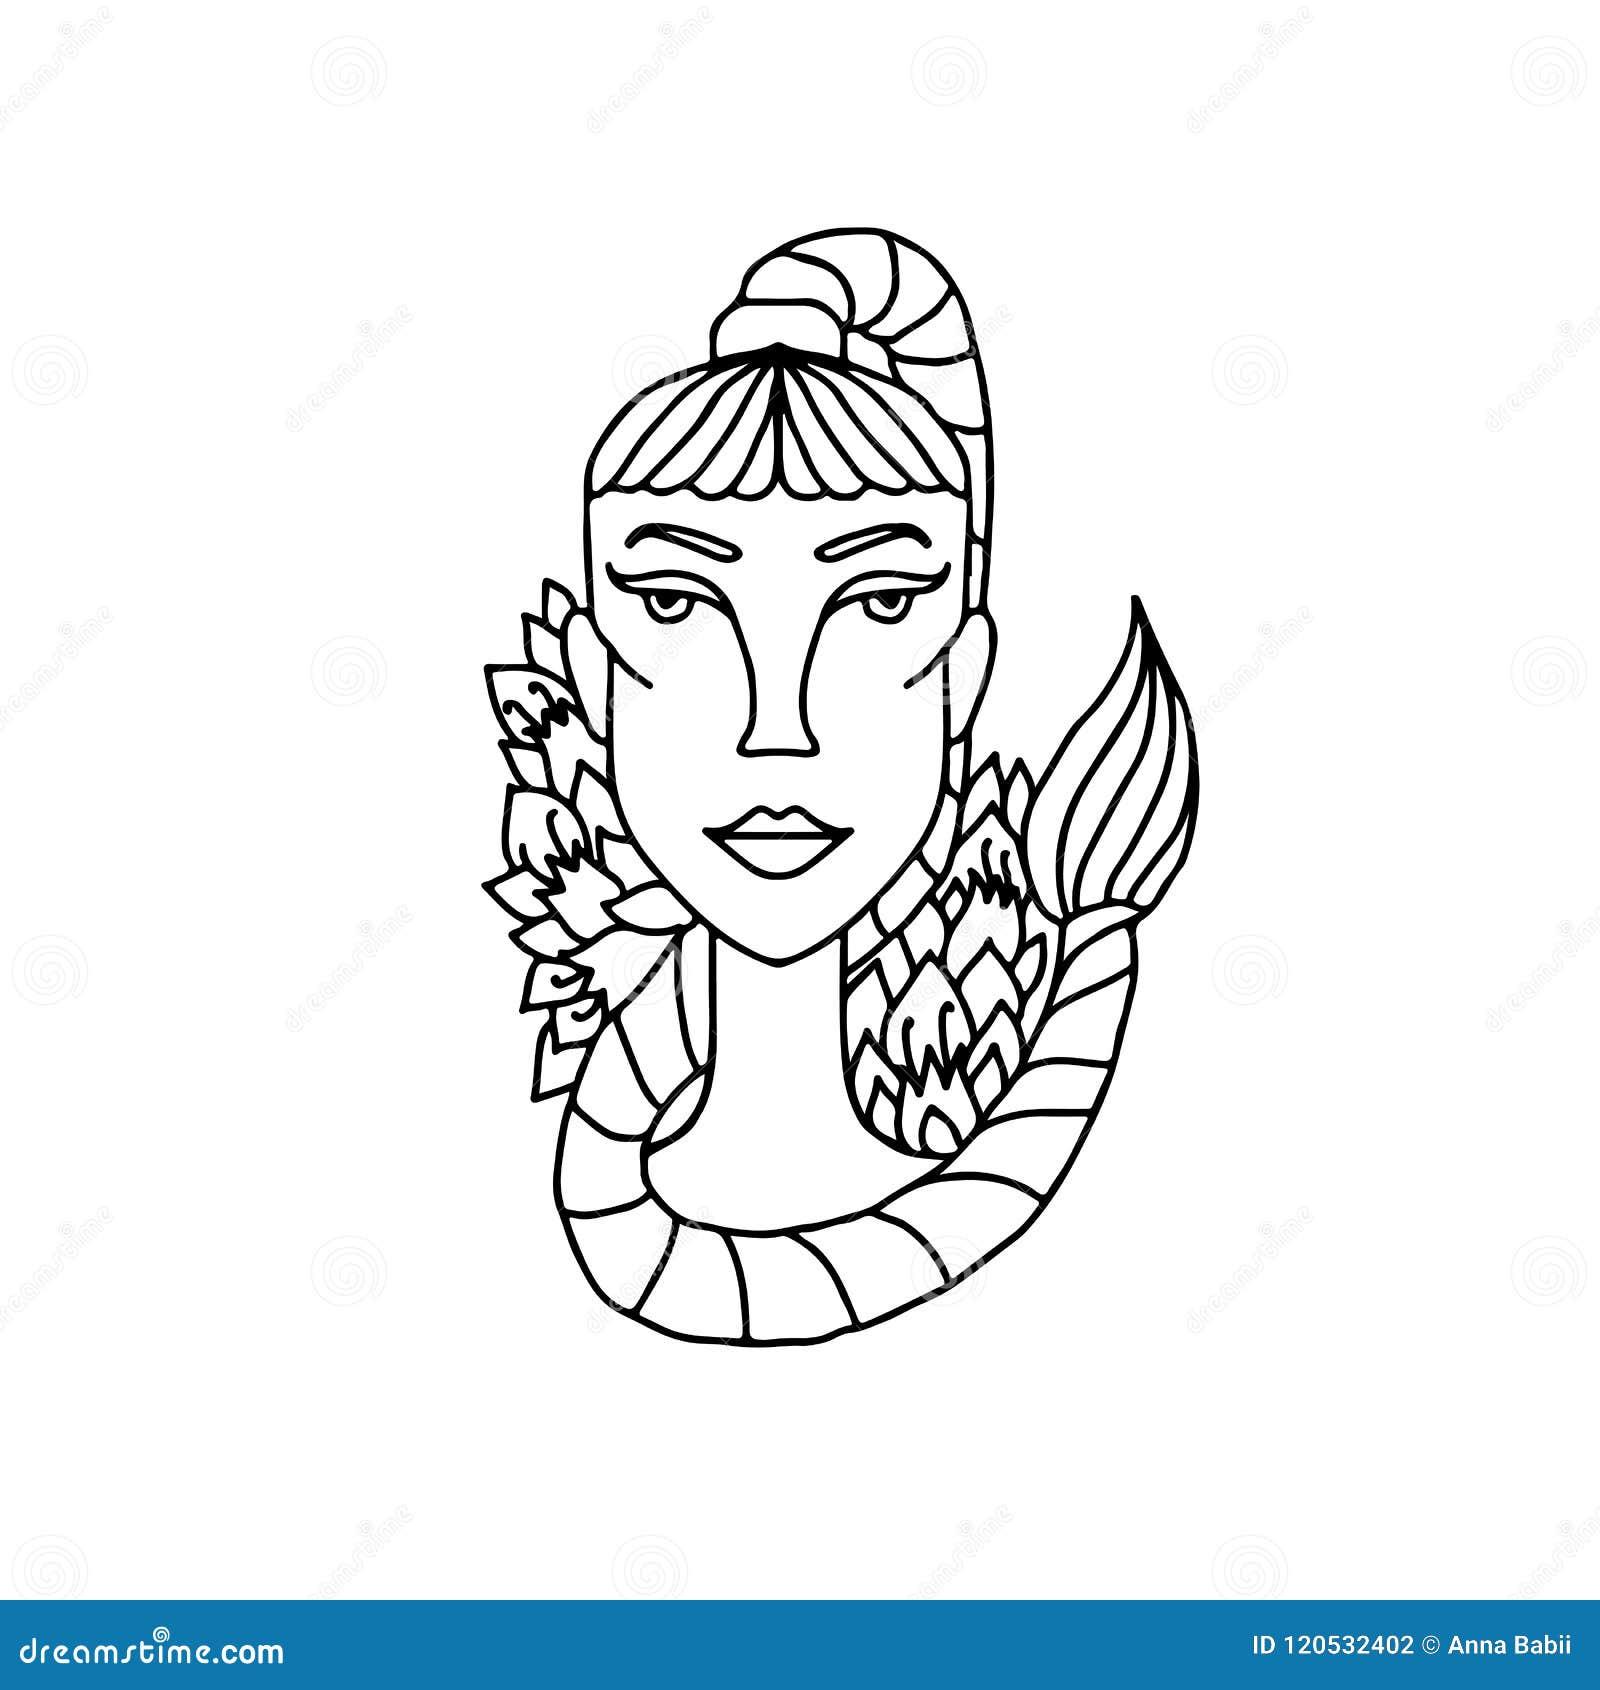 портрет девушки Scorpio знак зодиака для взрослой книжка